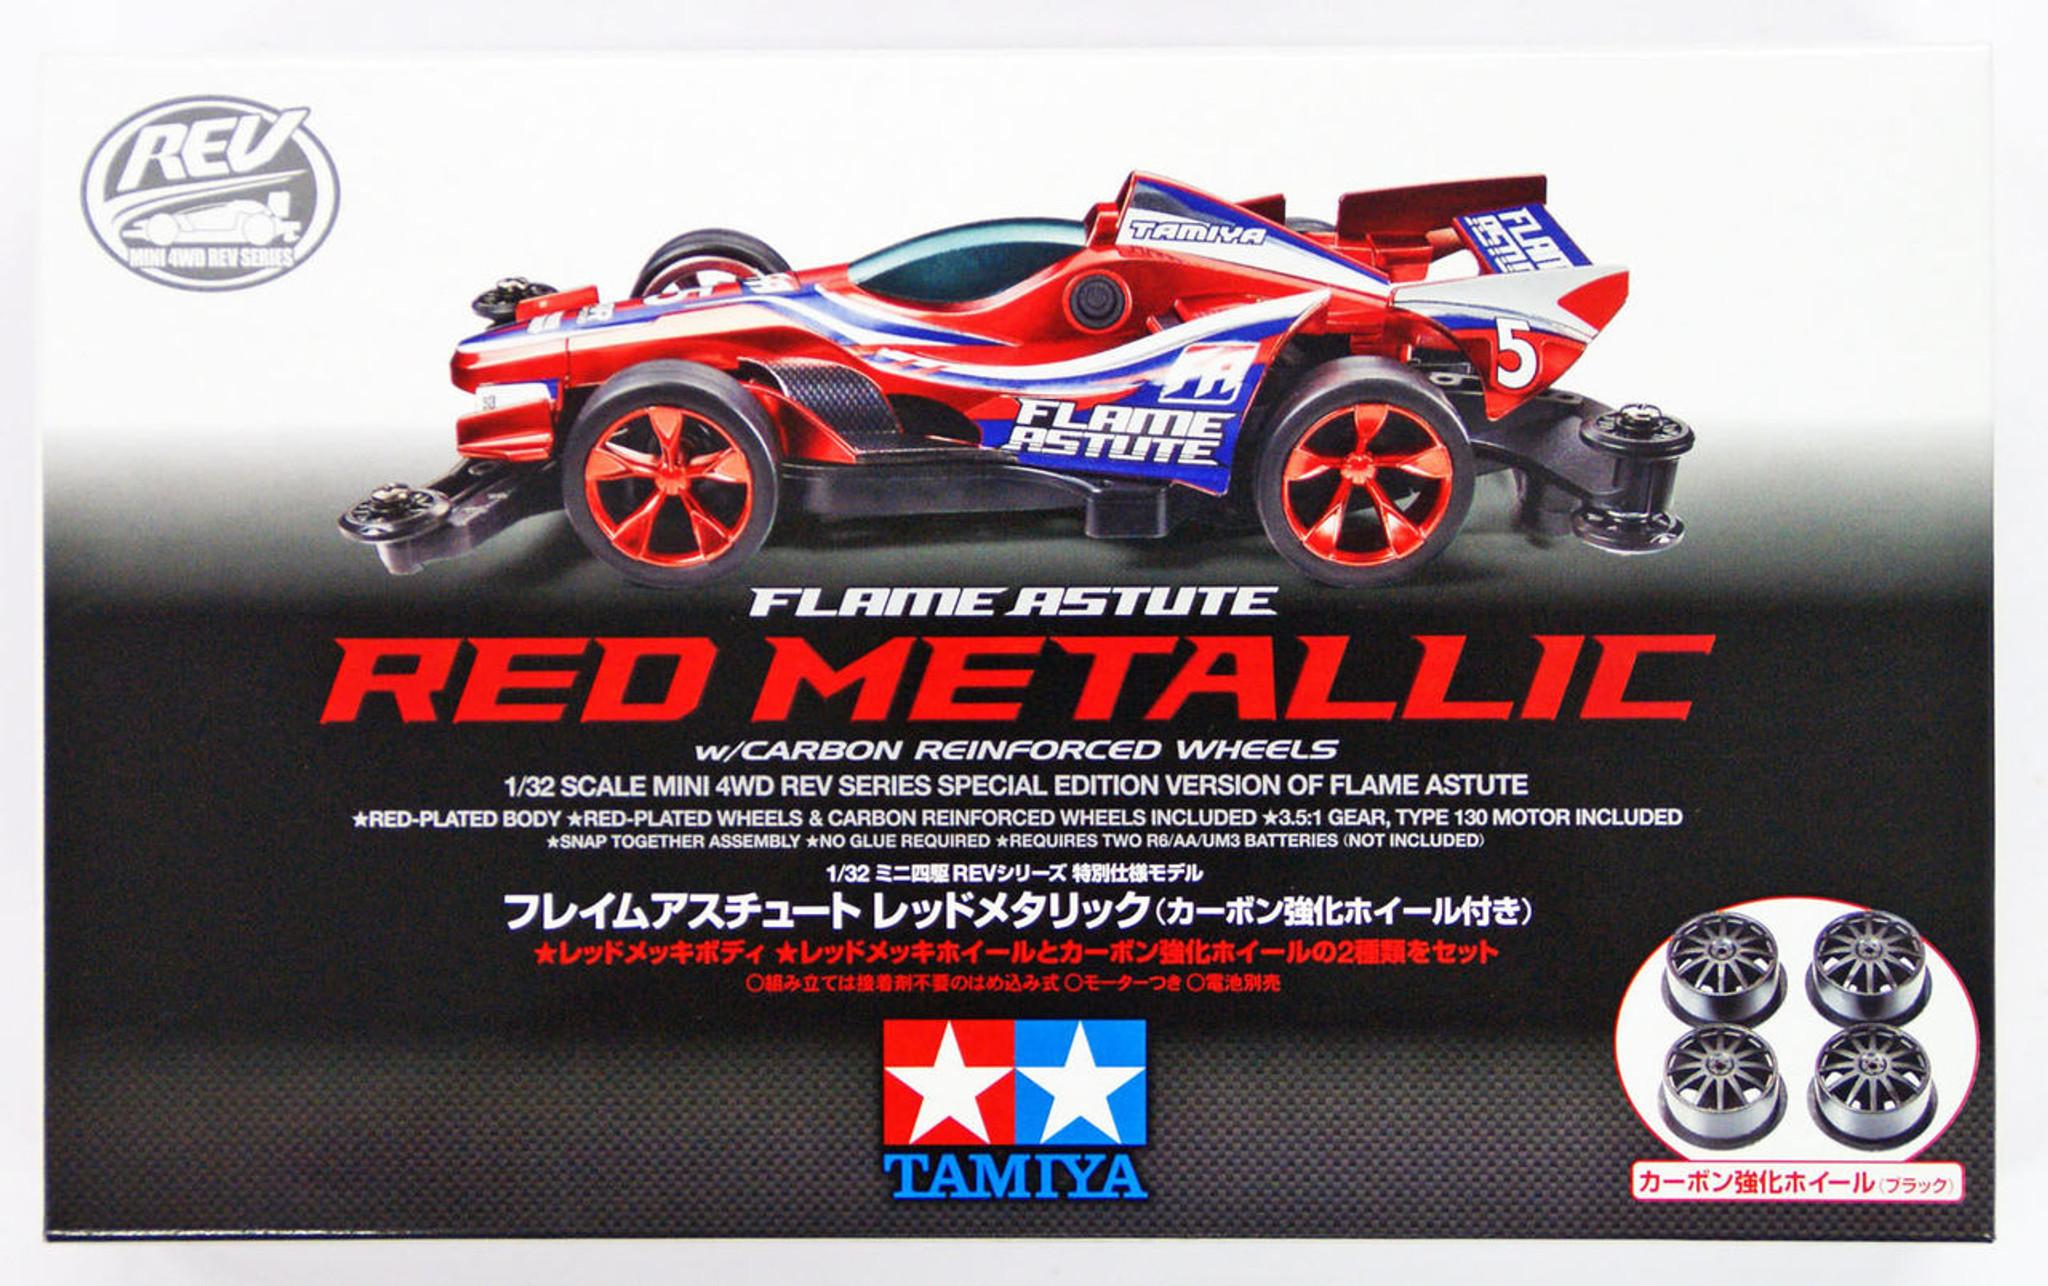 Tamiya Mini 4wd 95292 Flame Astute Red Metallic W Carbon Reinforced Super Ii Chassis Original Wheels 1 32